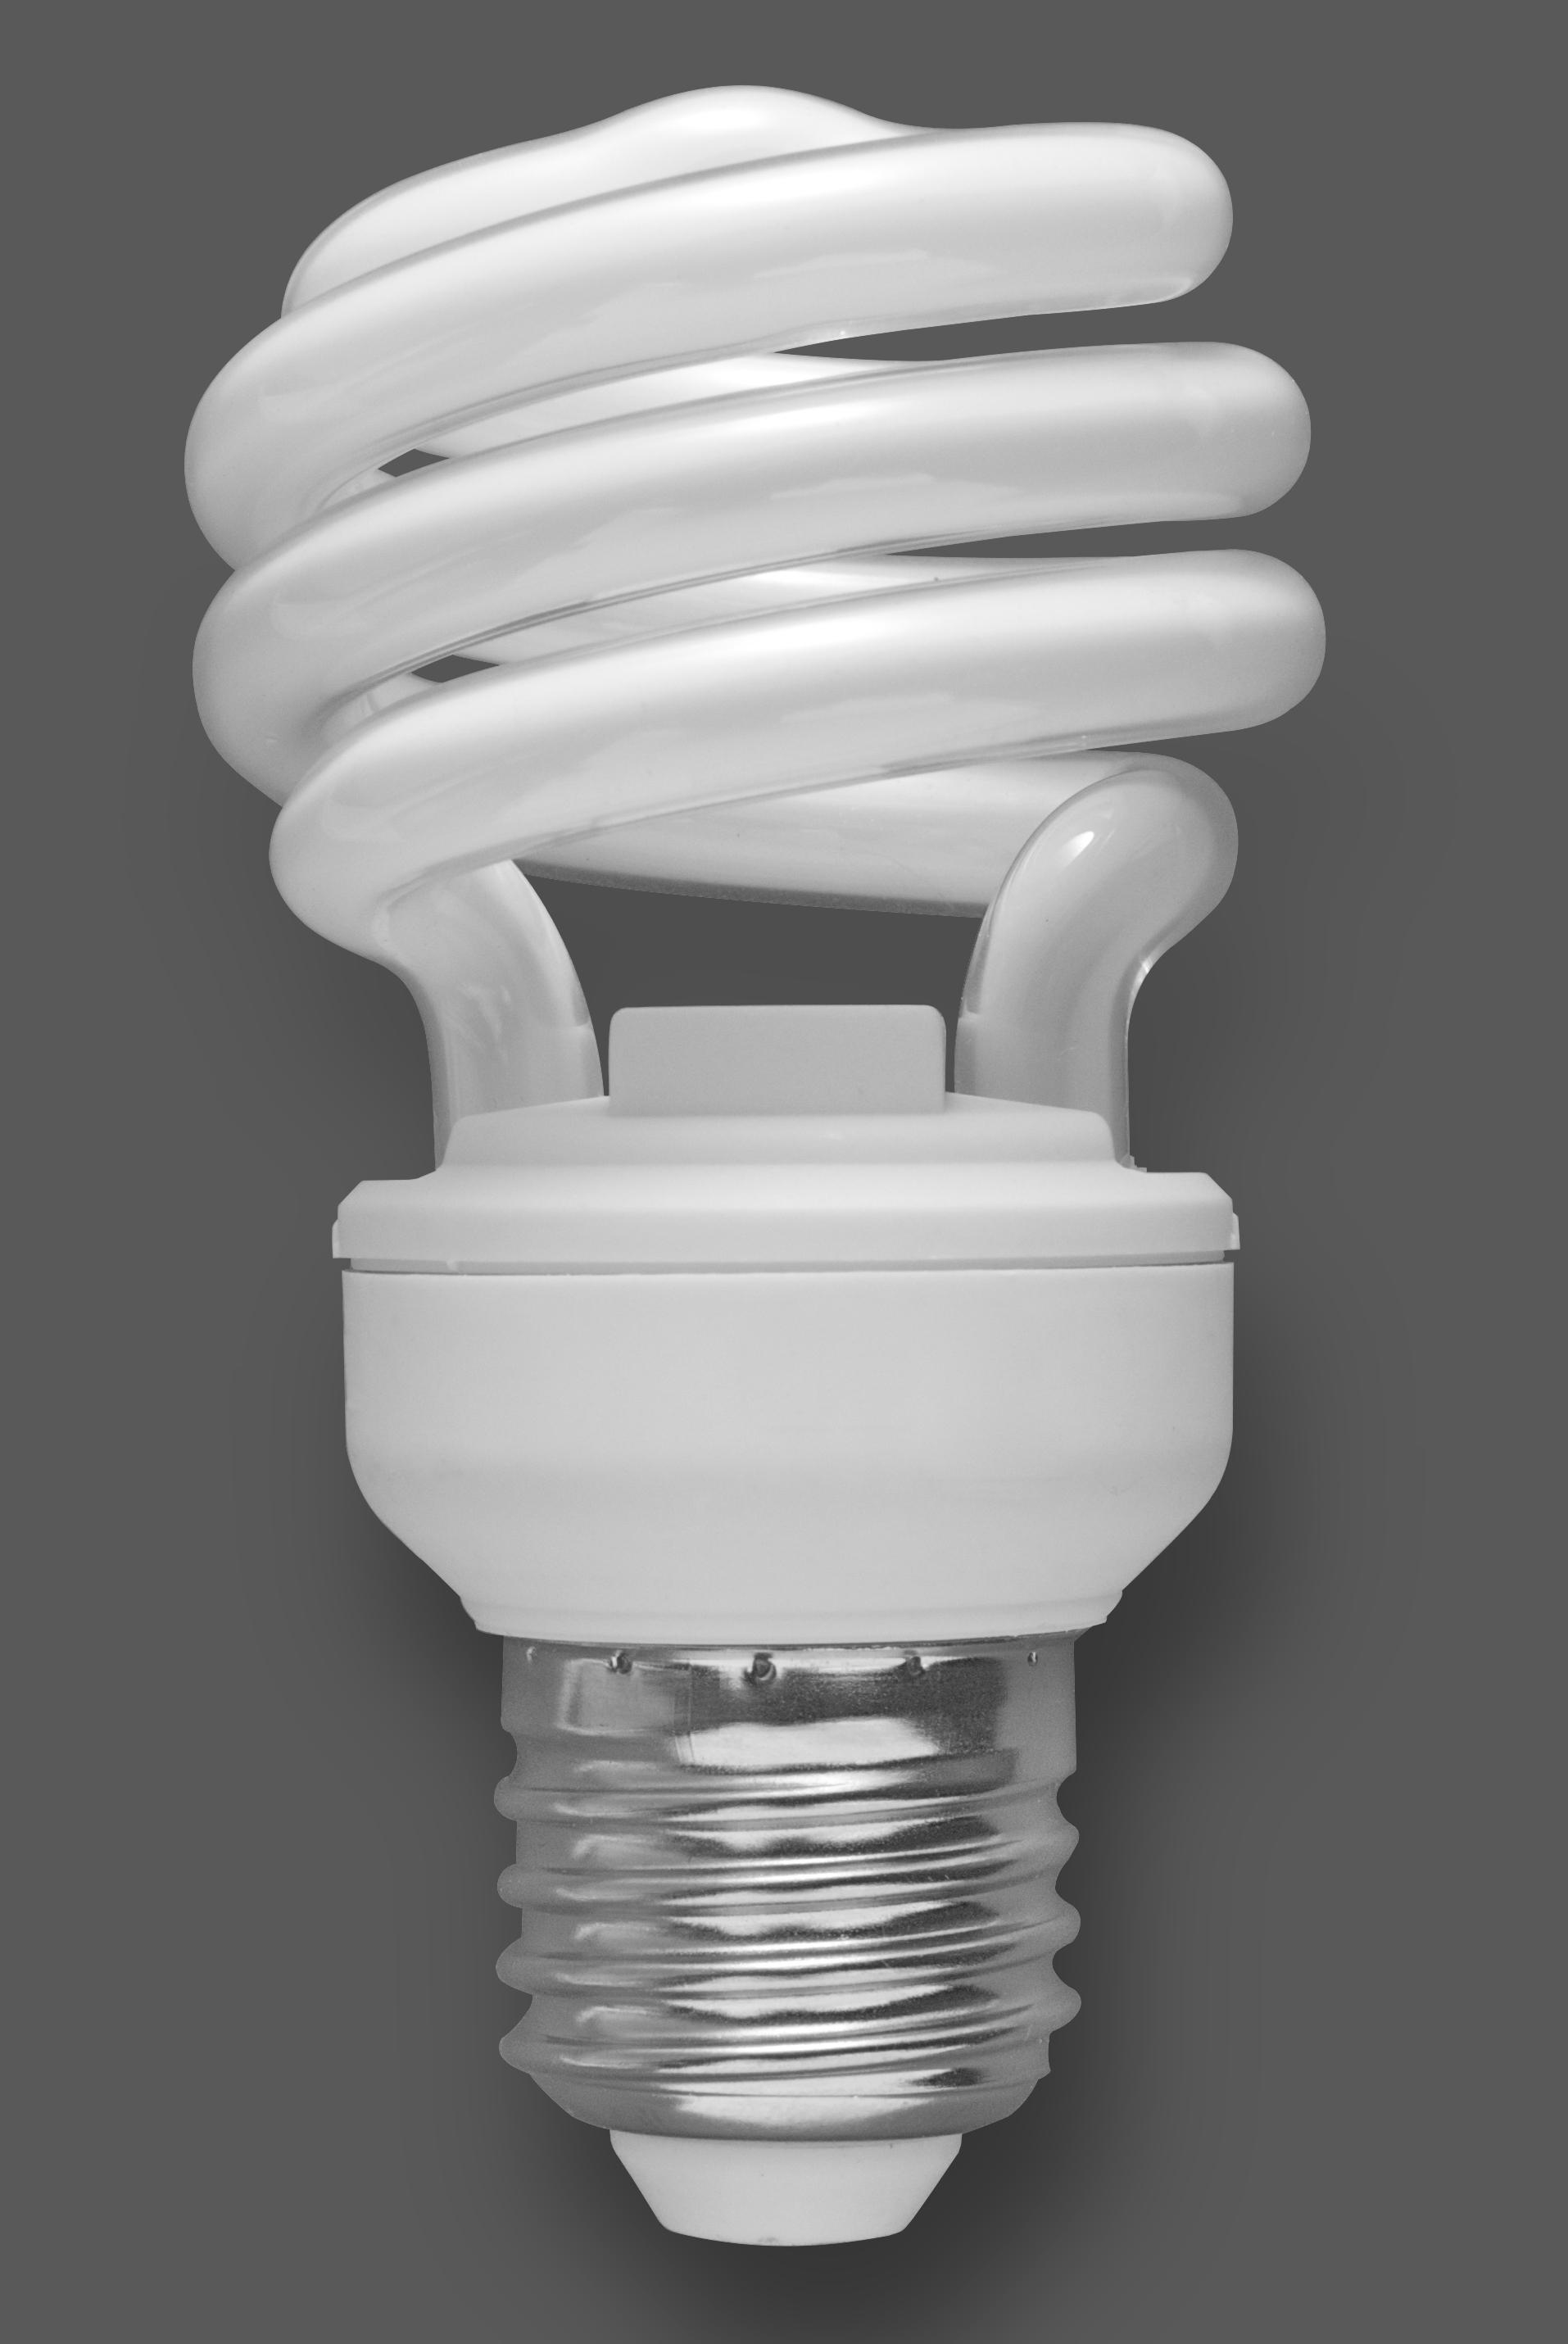 File03 Spiral CFL Bulb 2010 03 08 Gray 35 Back